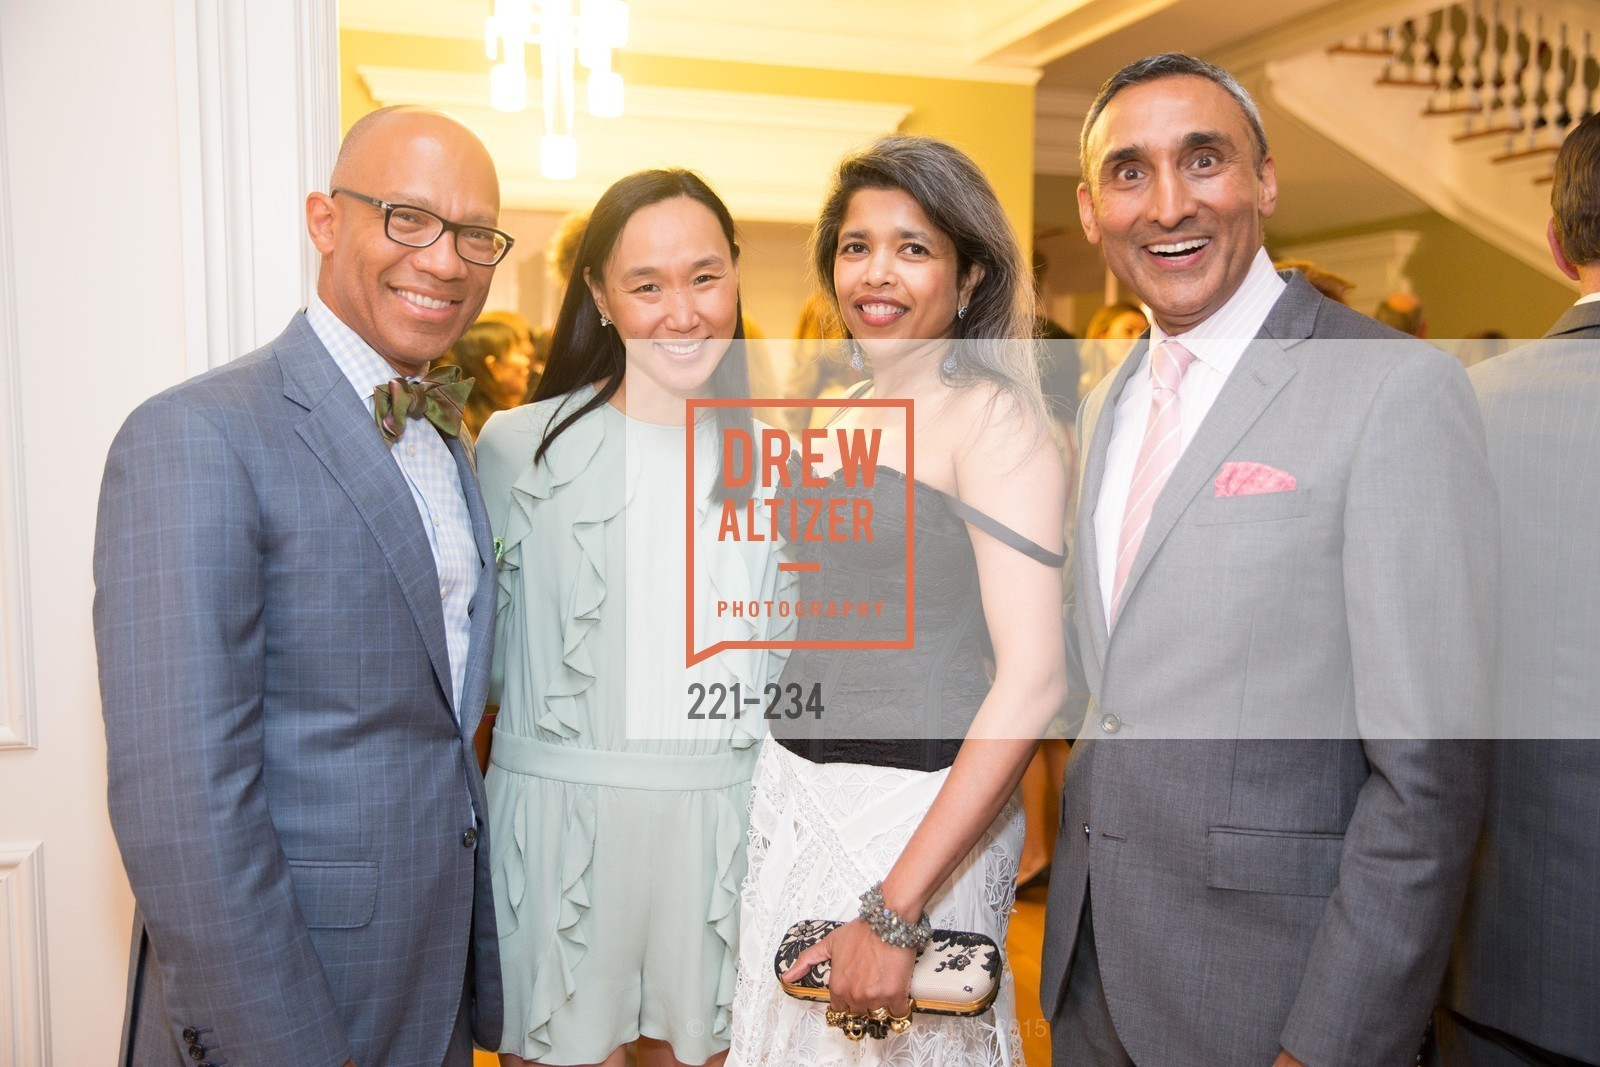 Ken McNeely, Carolyn Chang, Deepa Pakianathan, Inder Dhillon, Photo #221-234